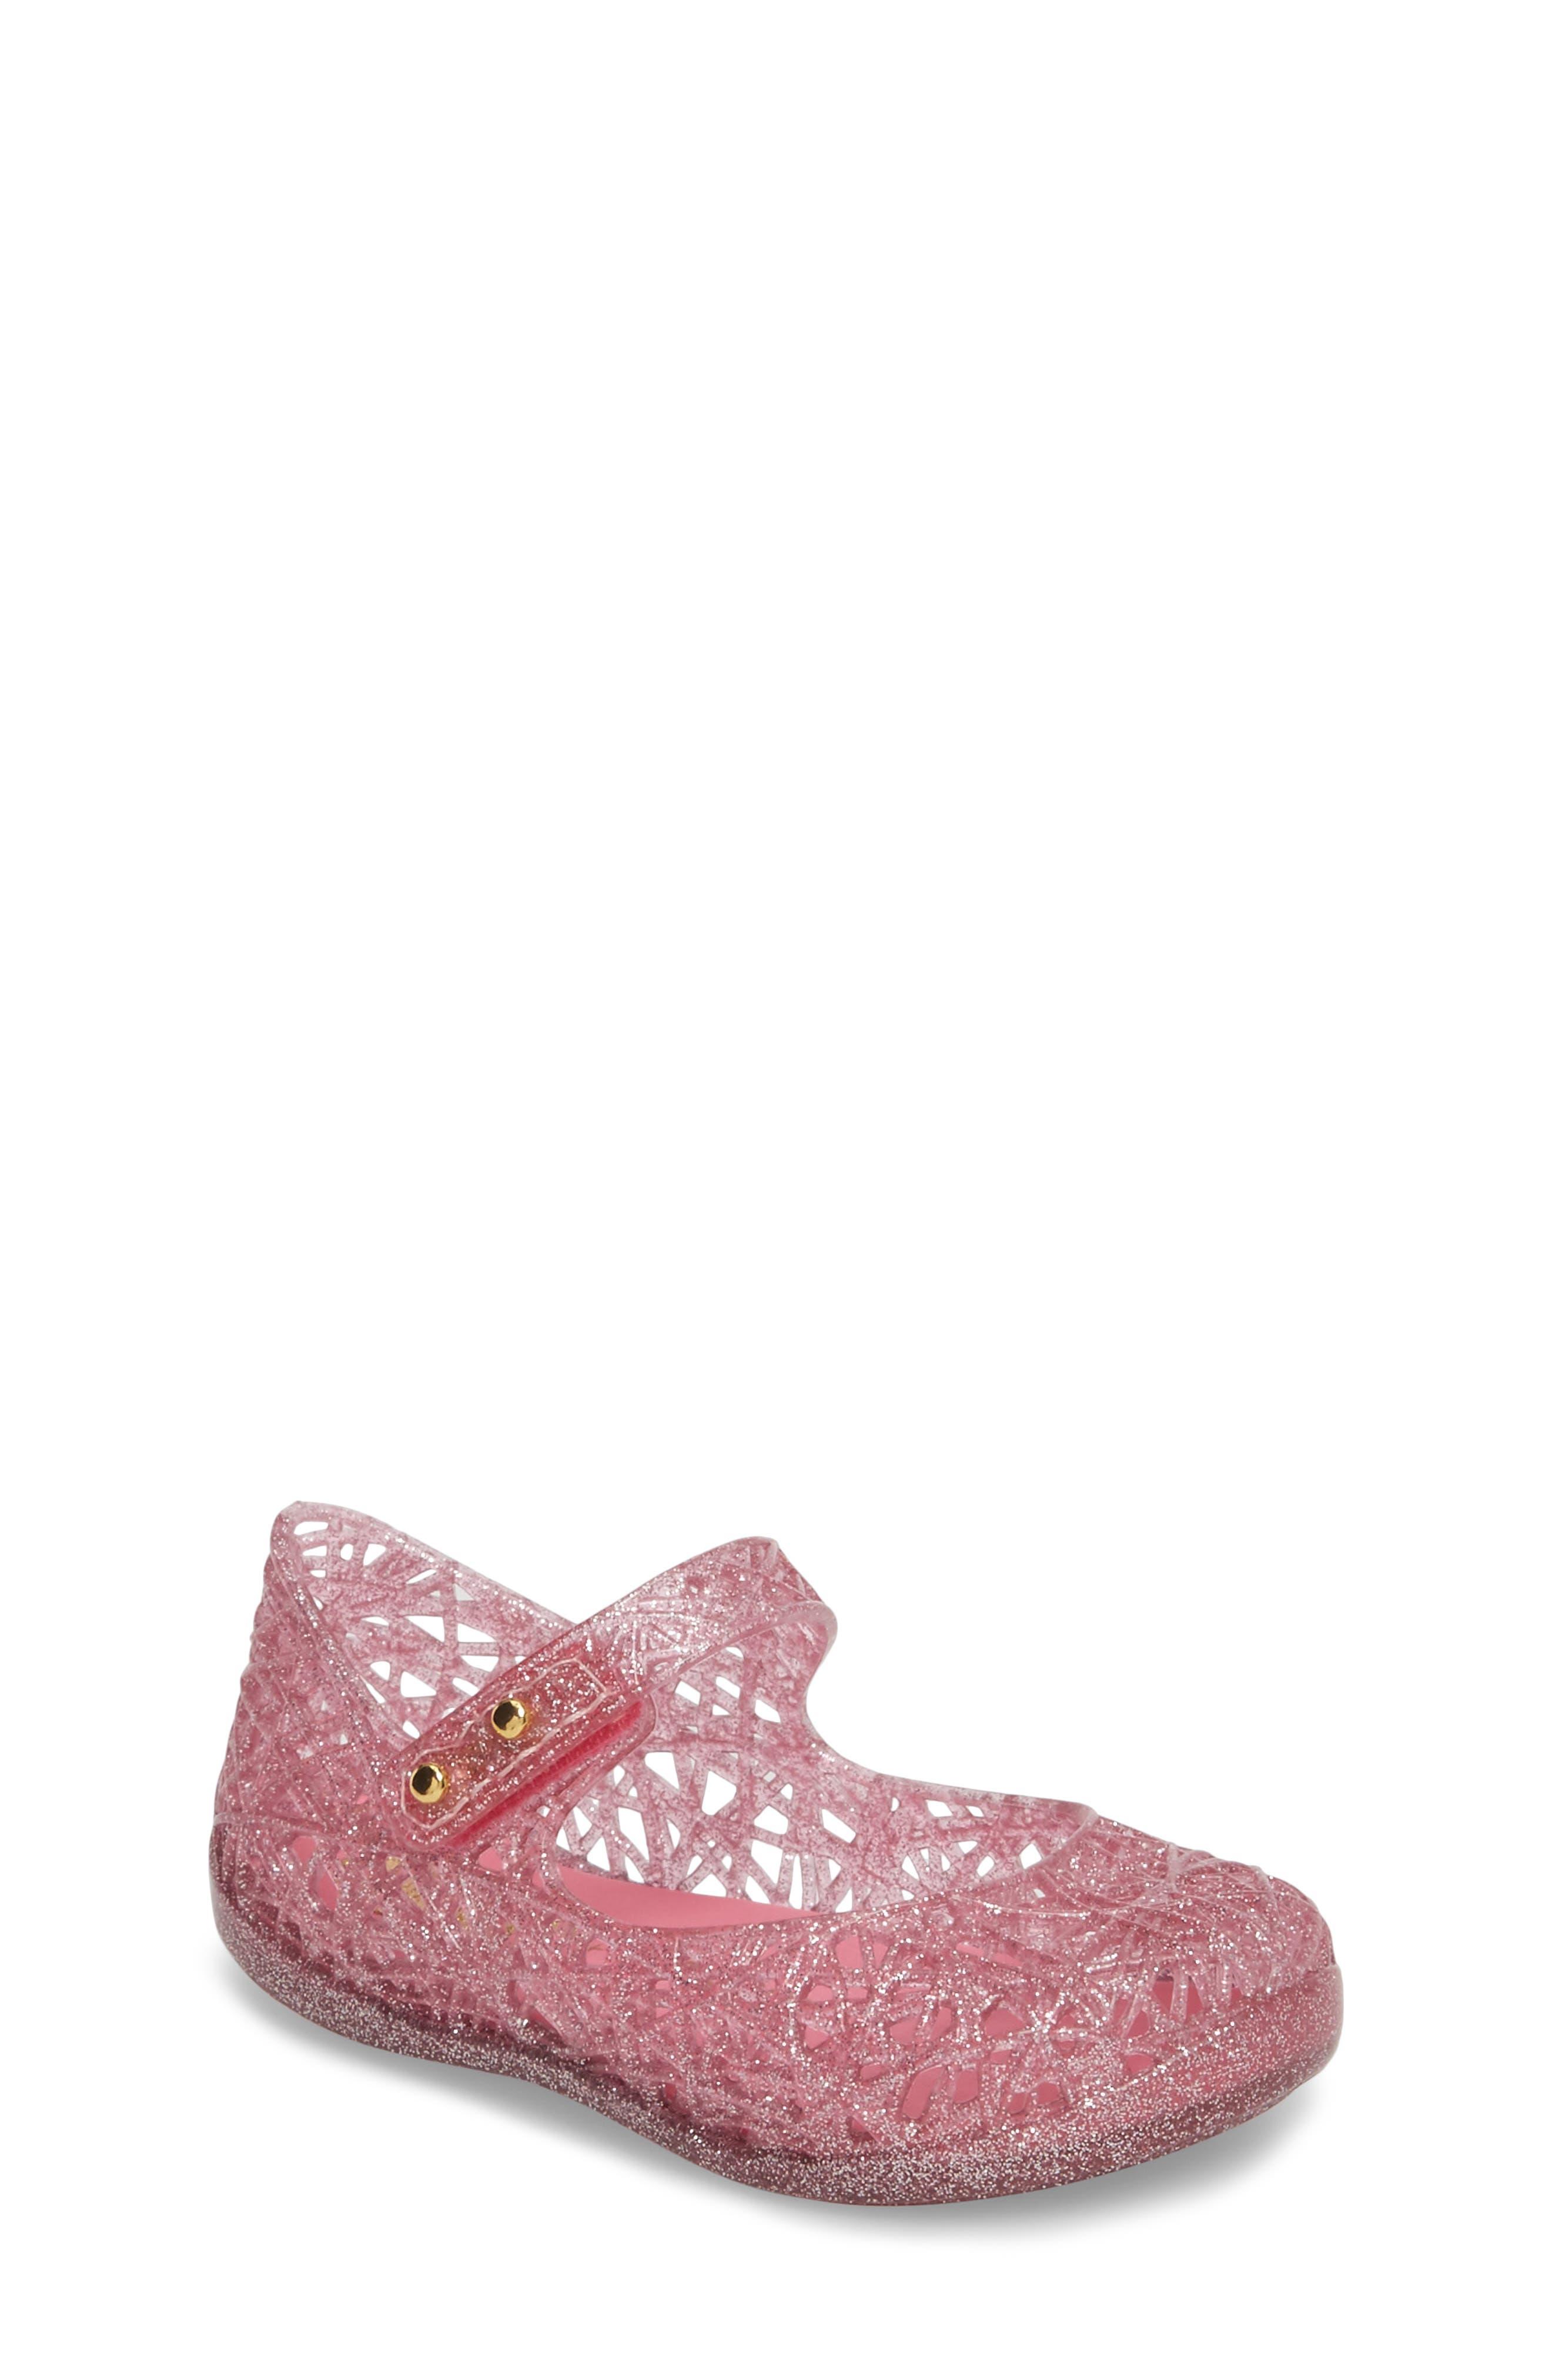 Toddler Girls' Mini Melissa Shoes